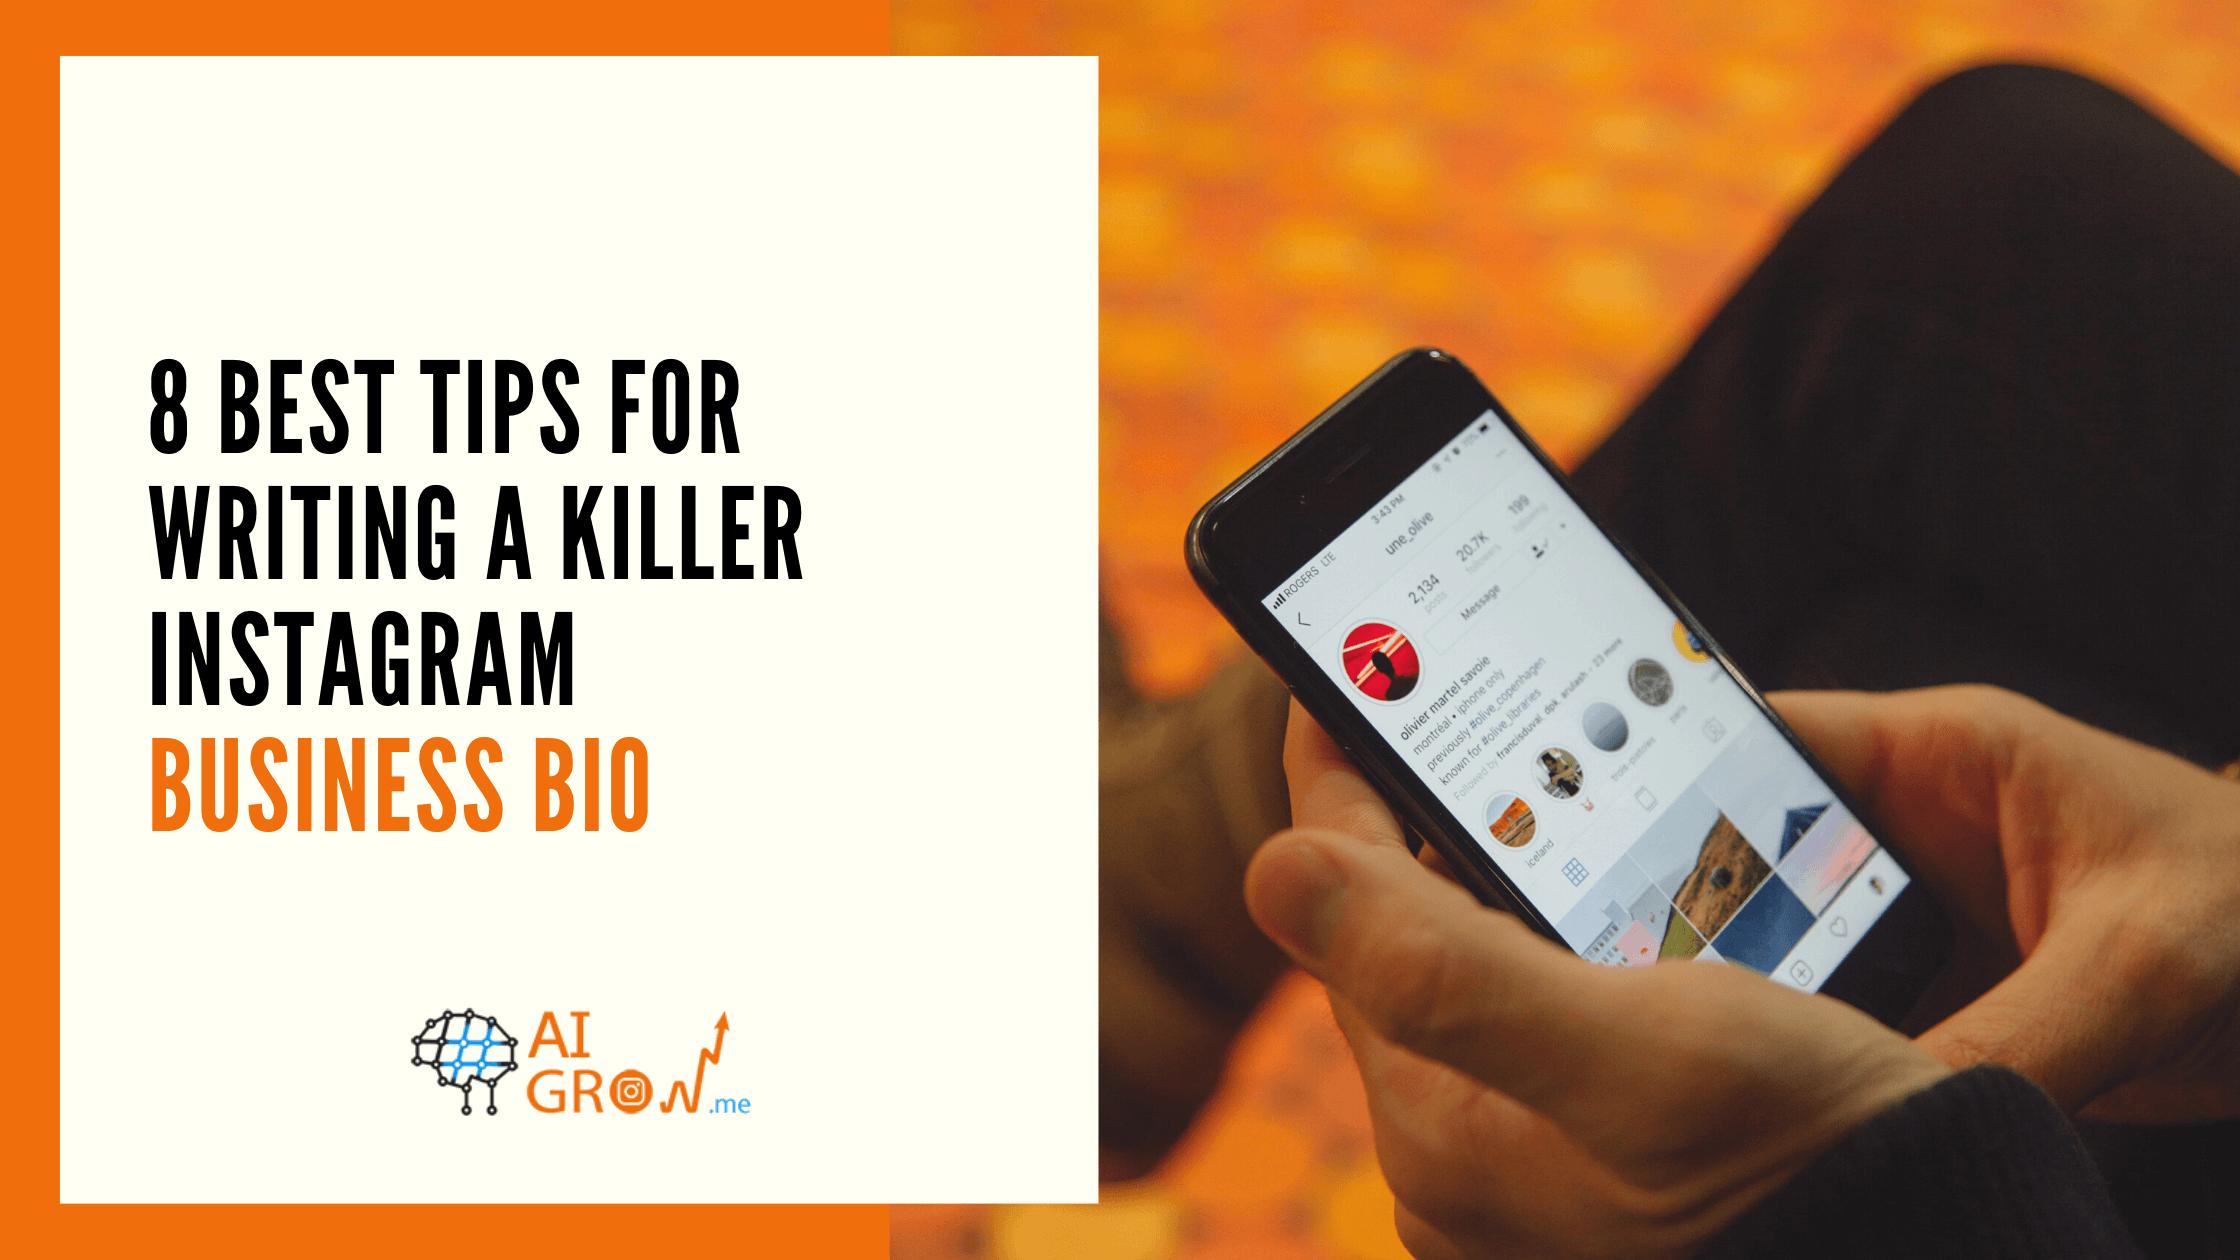 8 Best Tips For Writing a Killer Instagram Business Bio